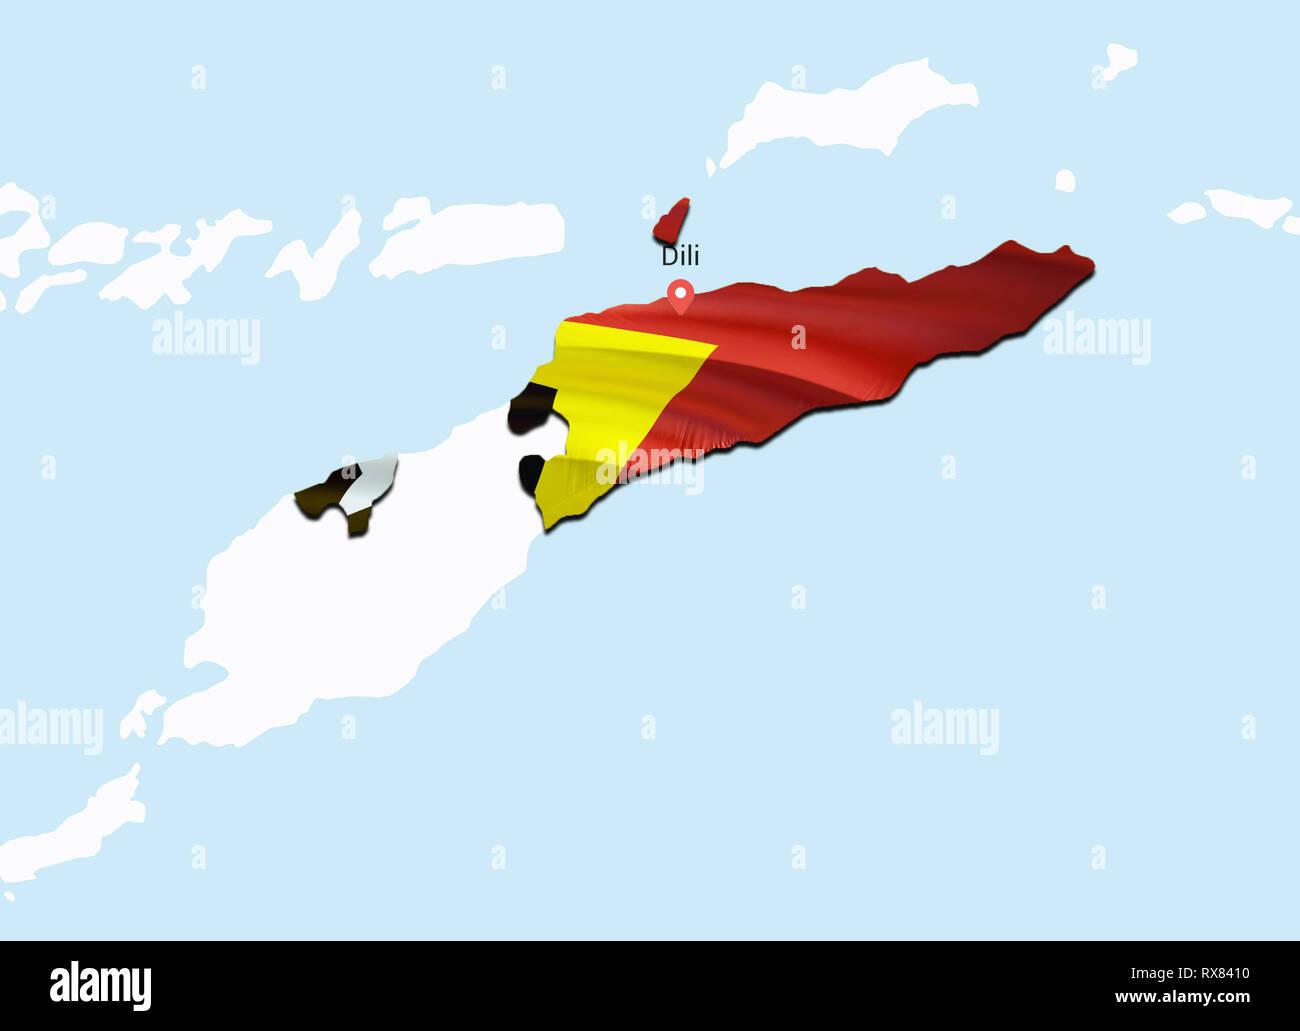 Flag Map of East Timor. 3D rendering East Timor map and flag ... East Timor Map on christmas island, west timor, malaysia map, bahrain map, banda sea map, southeast asia, portuguese timor, sudan map, papua new guinea map, laos map, southeast asia map, yemen arab republic, solomon islands map, tonga map, brazil map, taur matan ruak, ecuador map, flag of east timor, borneo map, philippines map, indonesia map, vietnam map, maldives map, eritrea map, east asia map, saint vincent and the grenadines, myanmar map, brunei map, portuguese language, saint kitts and nevis,